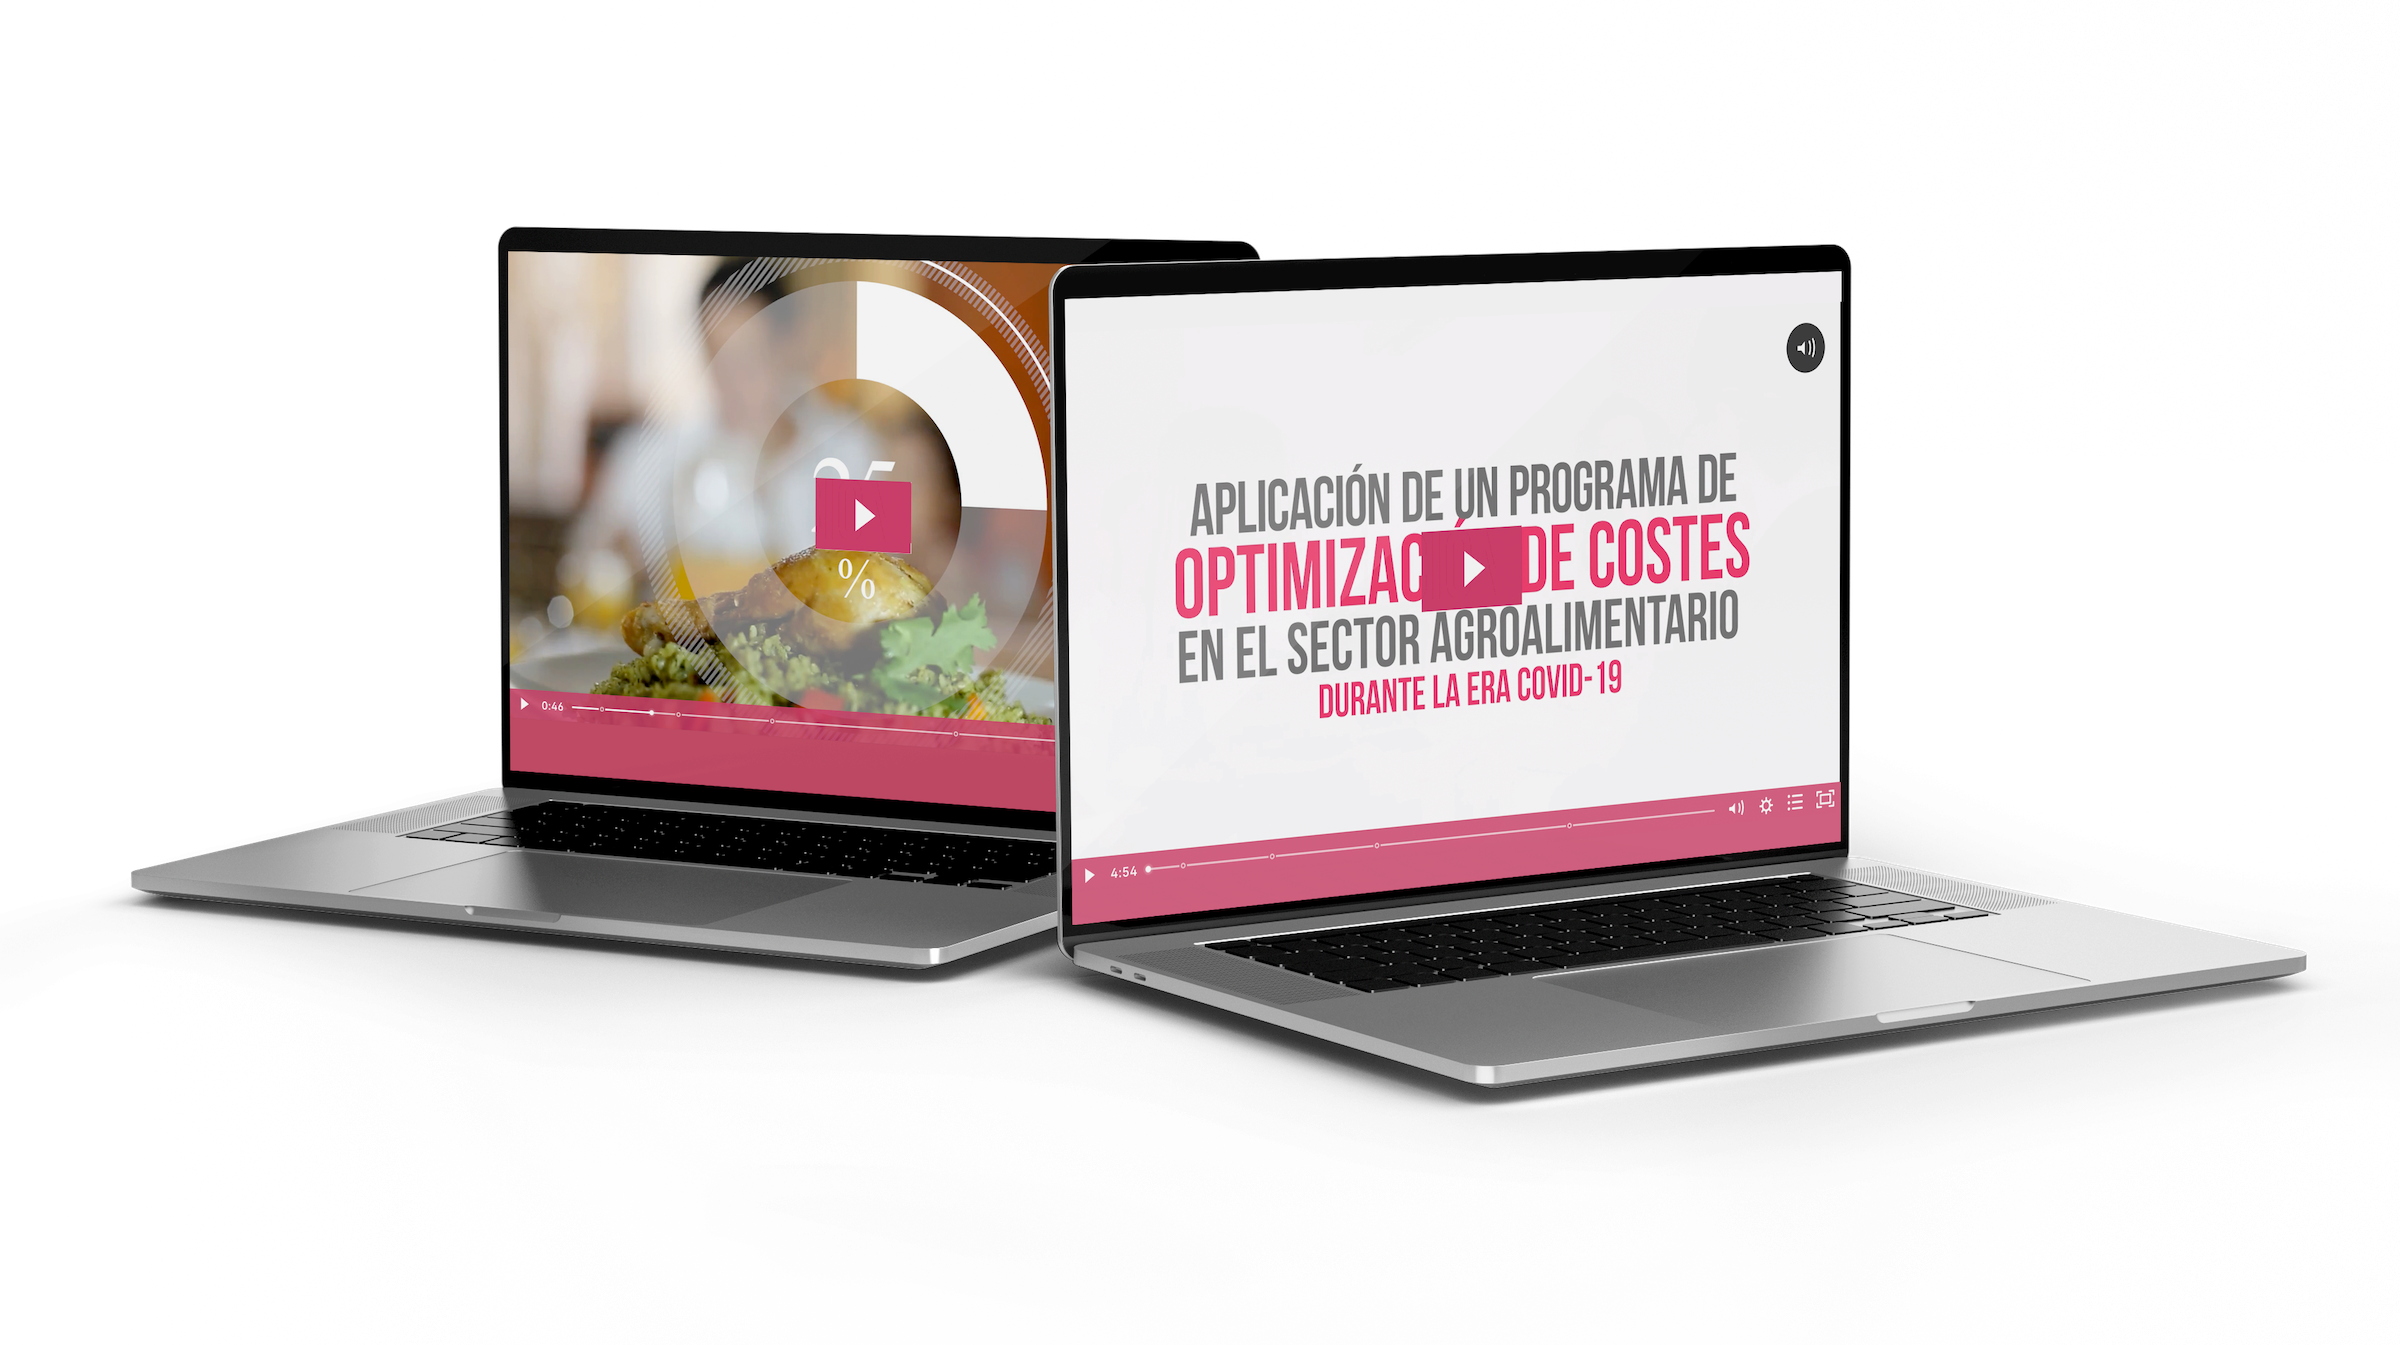 Videoguía: Aplicación de un programa de optimización de costes en el sector Agroalimentario